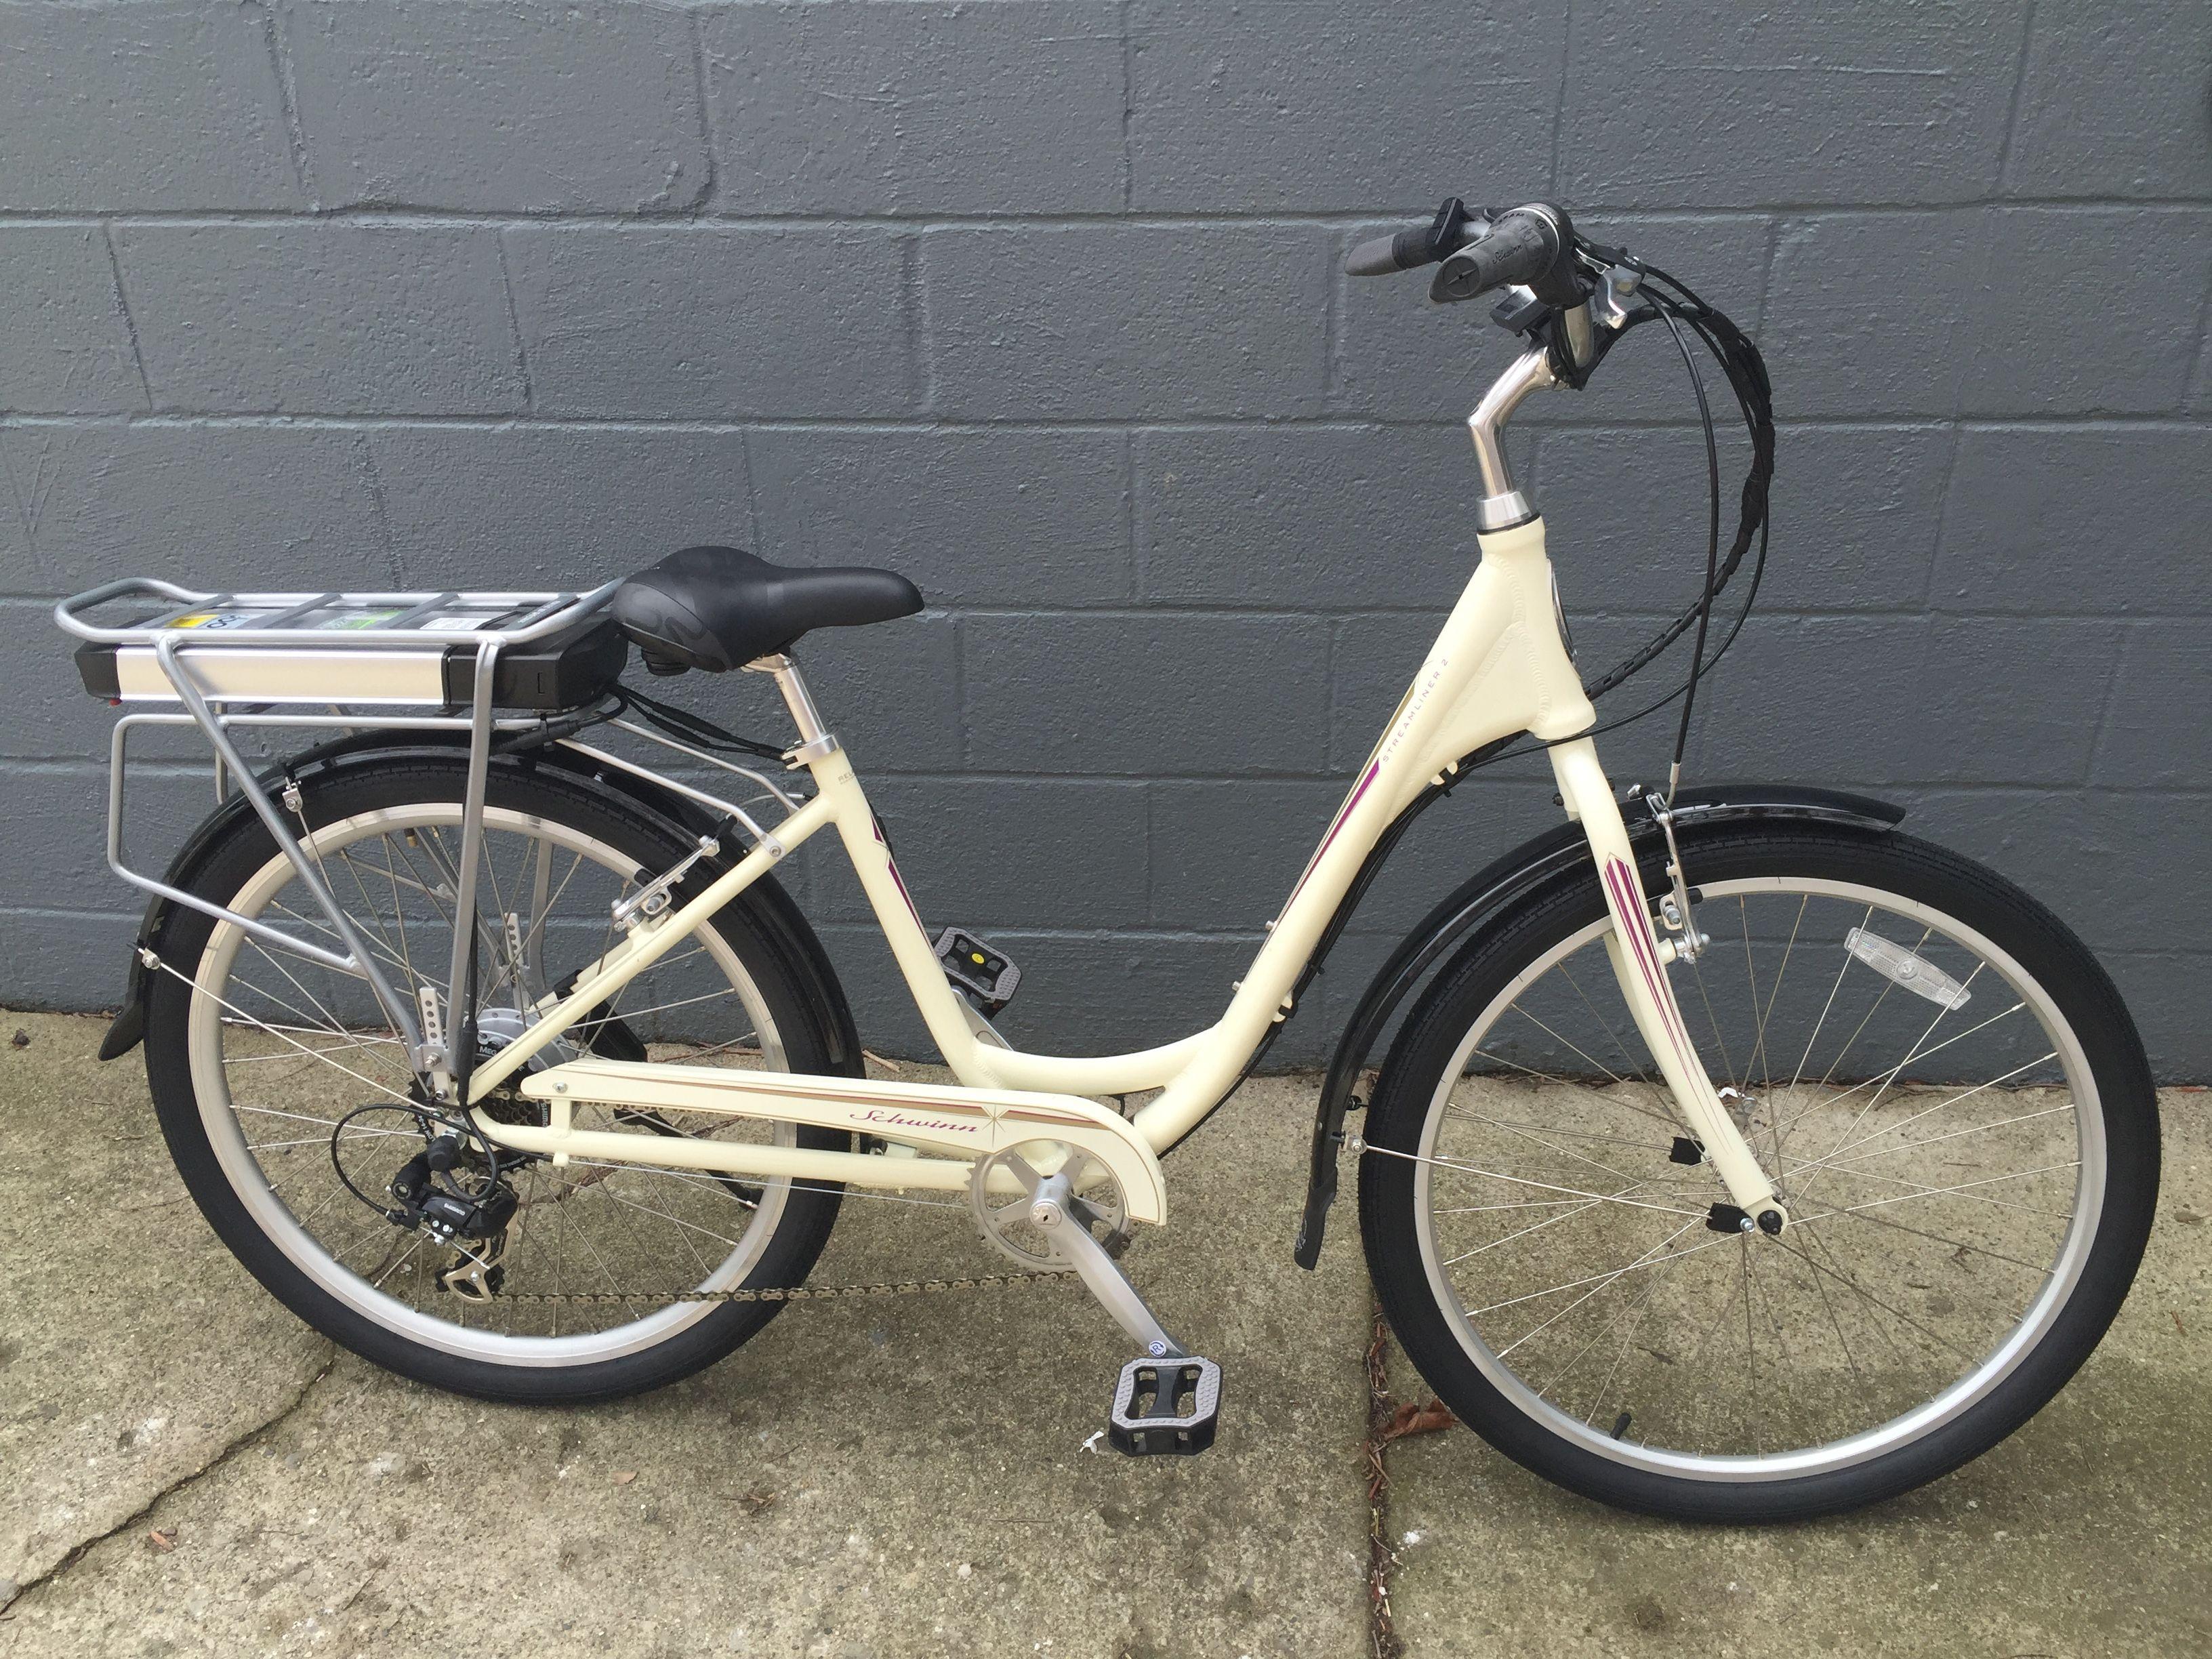 Schwinn Izip Electric Mountain Bike Wiring Diagram For Professional Fresh Mtb Chargers Bicycles